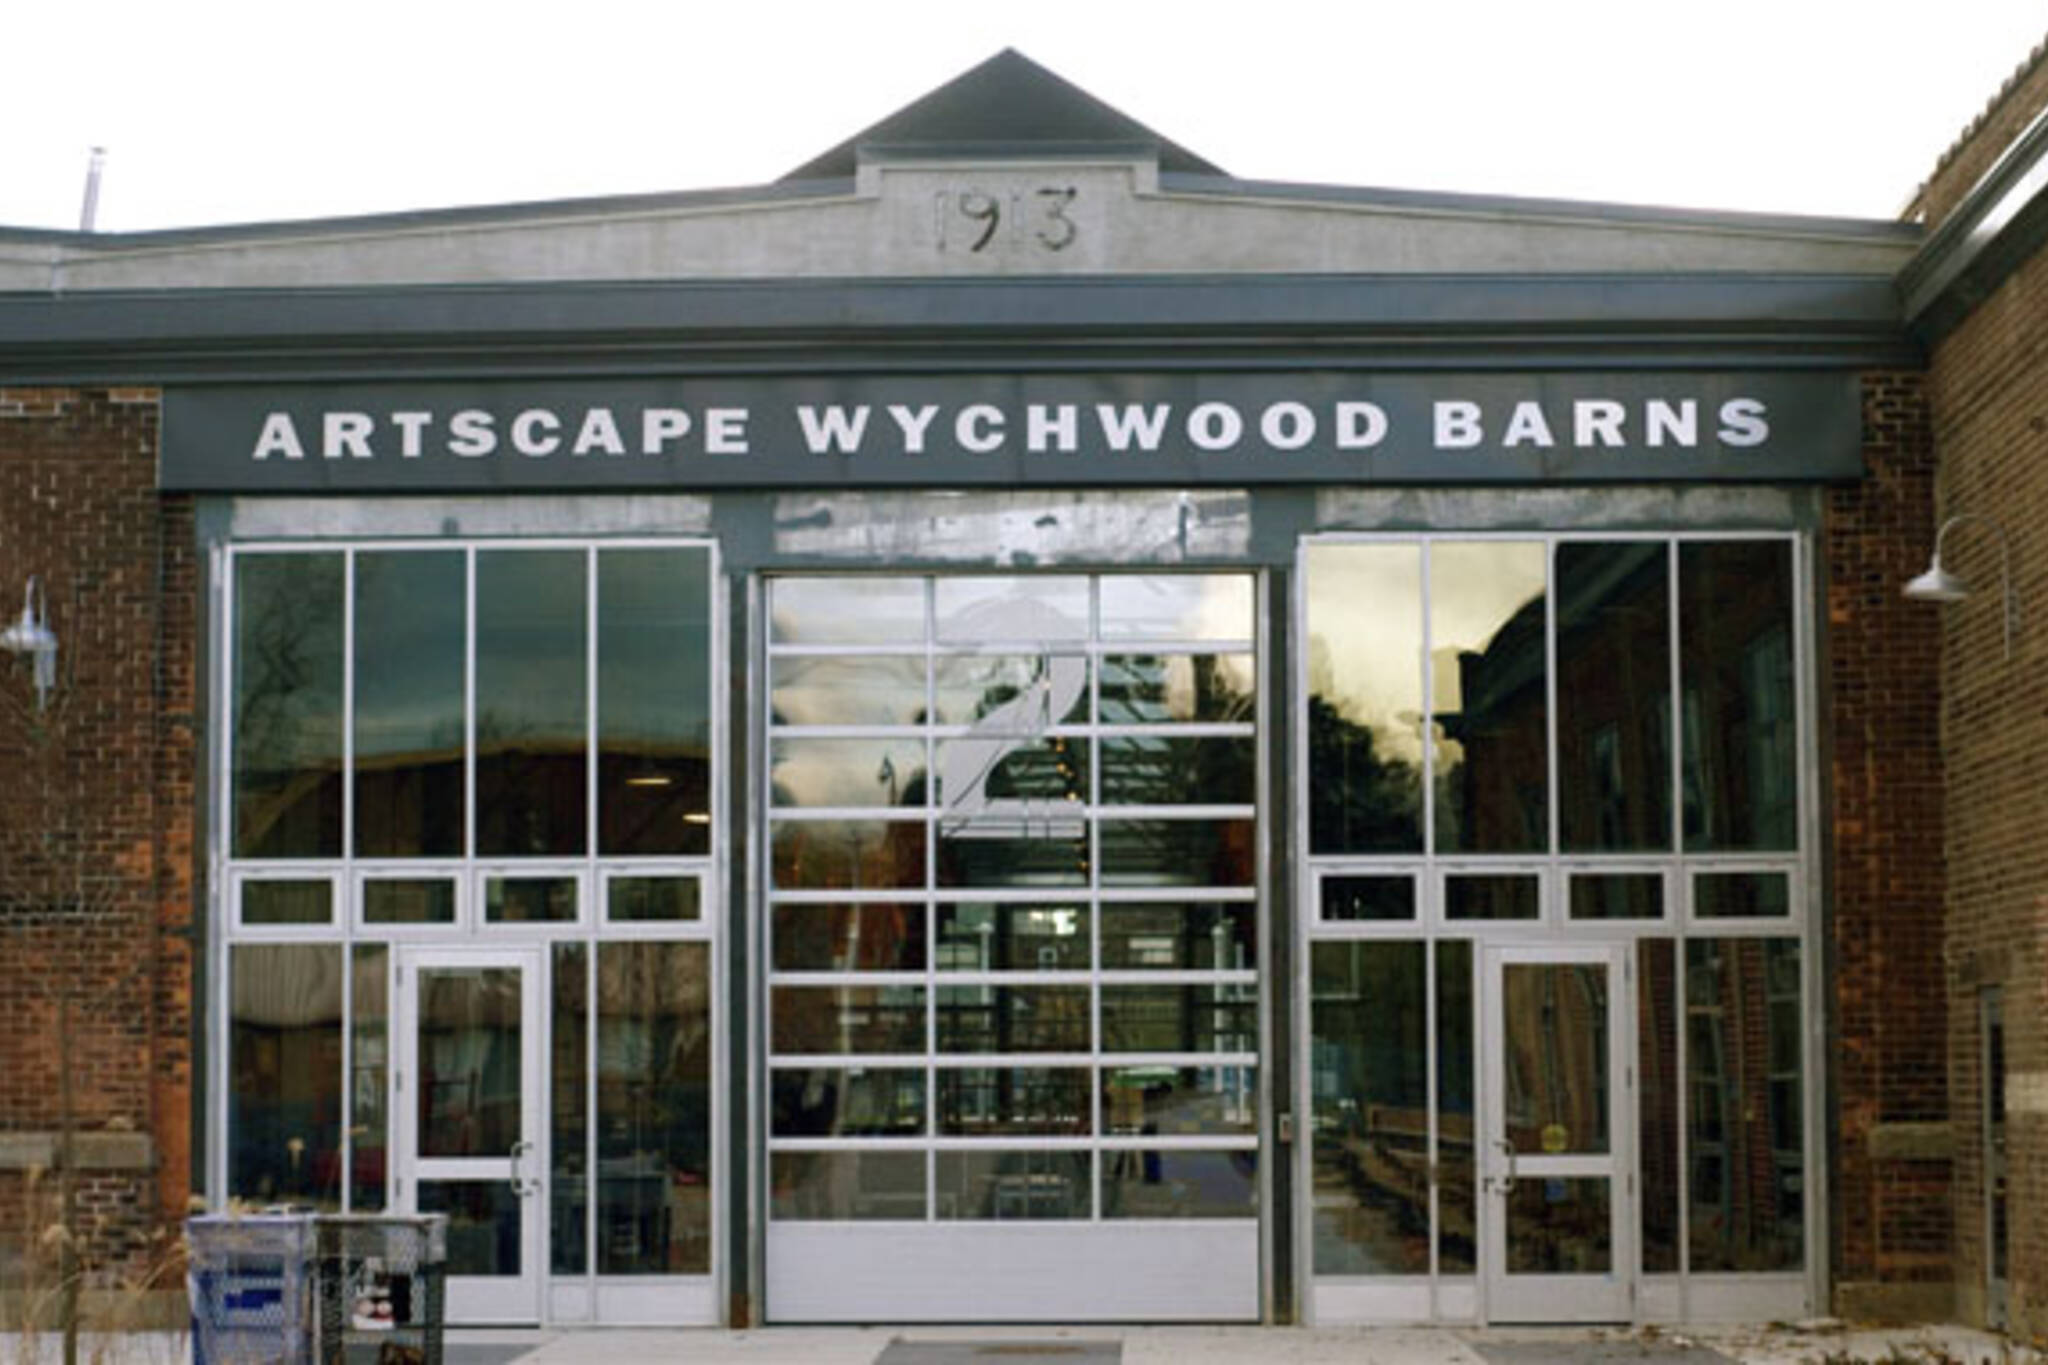 Artscape Wychwood Barns opening